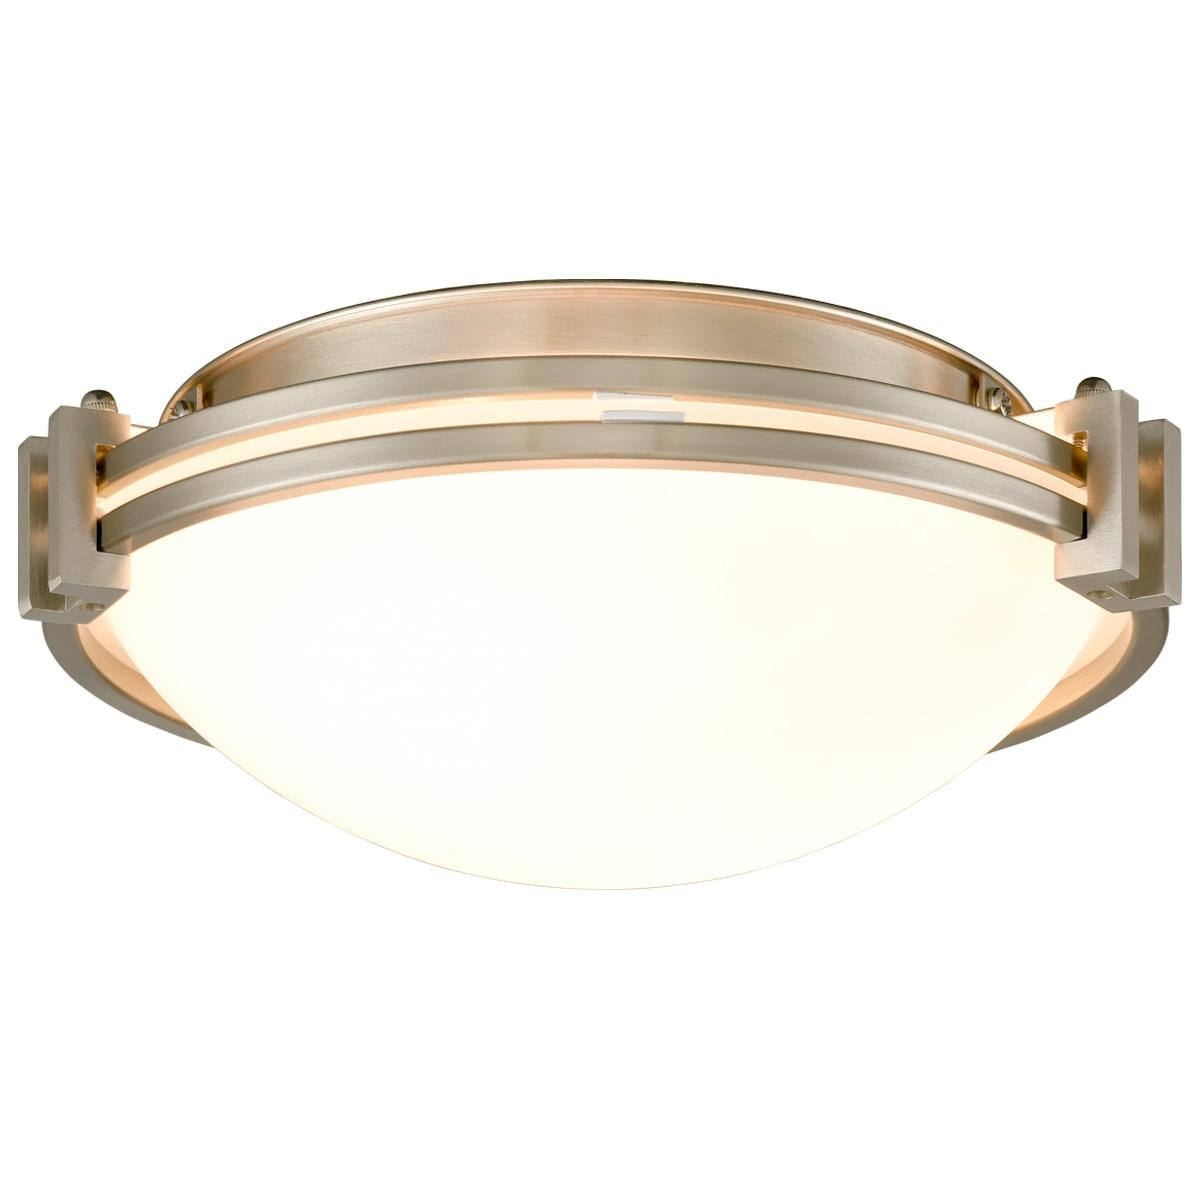 12 Inches Flush Mount Ceiling Light Fixture Satin Nickel Finish